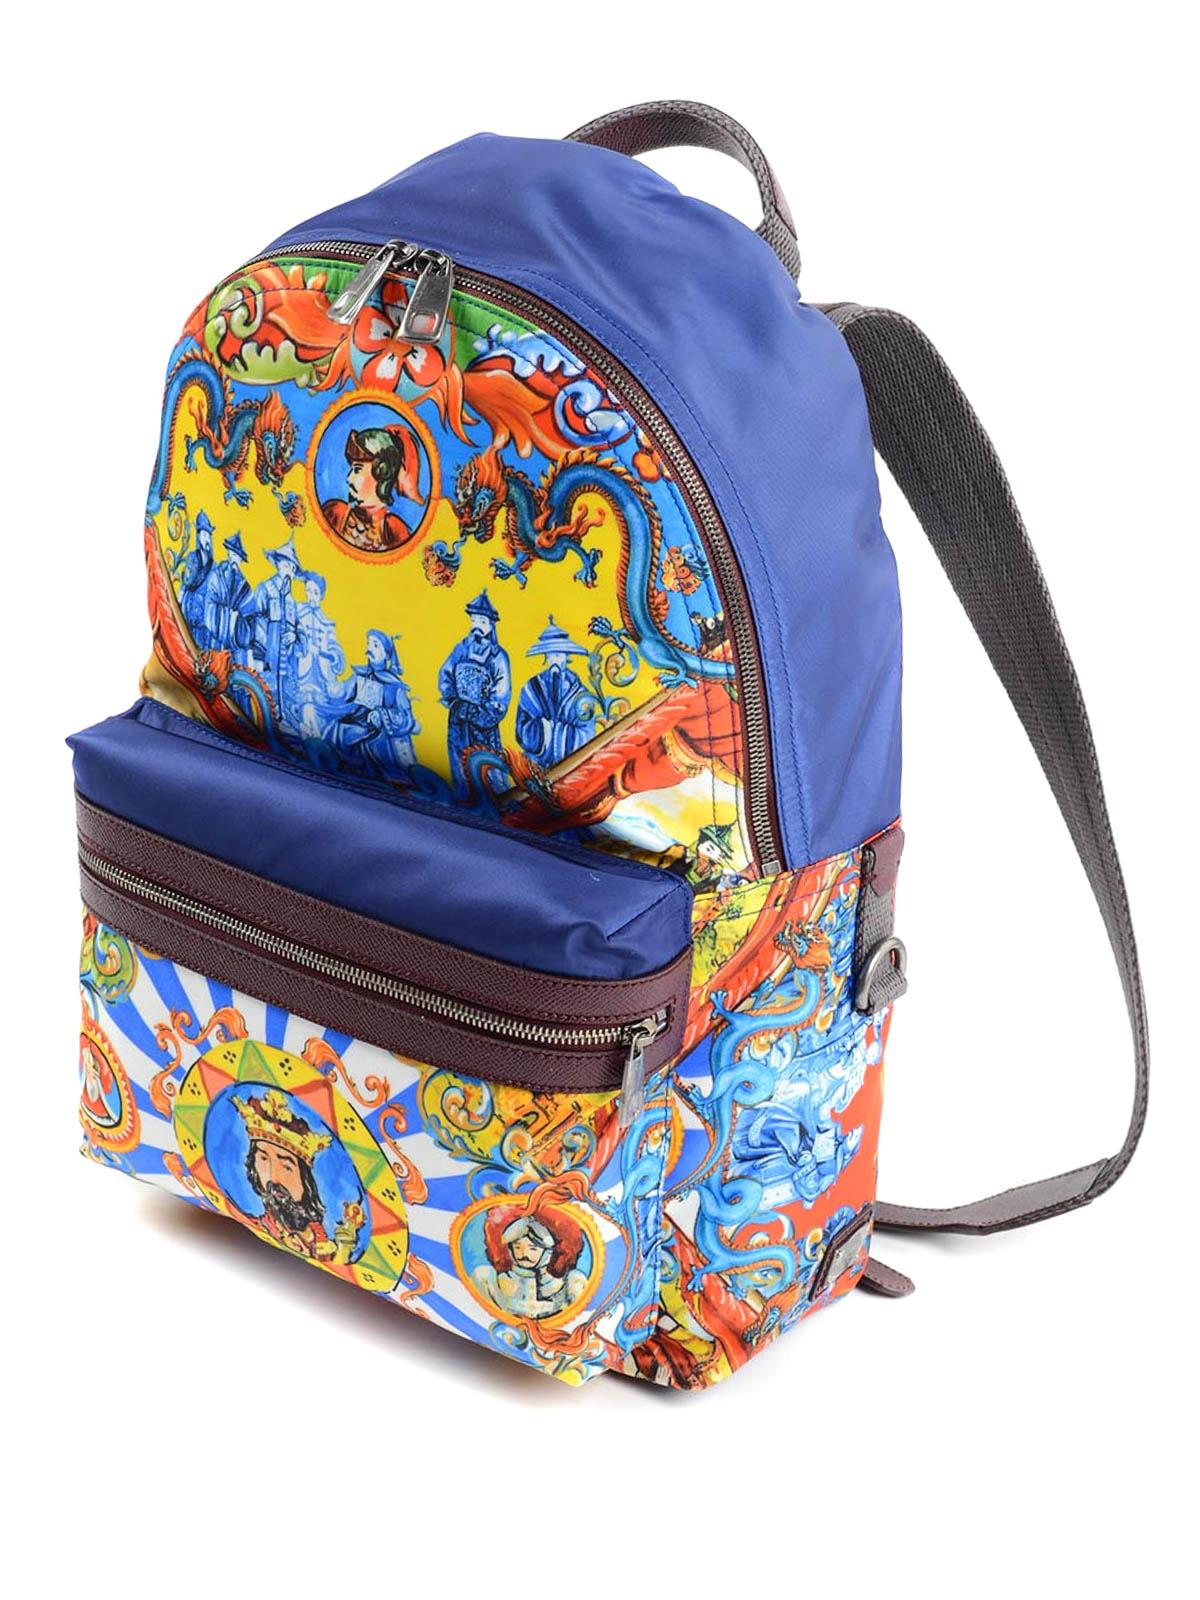 f8a136d6371 Dolce & Gabbana - Mochila Multicolor Para Hombre - Mochilas - BM1263 ...